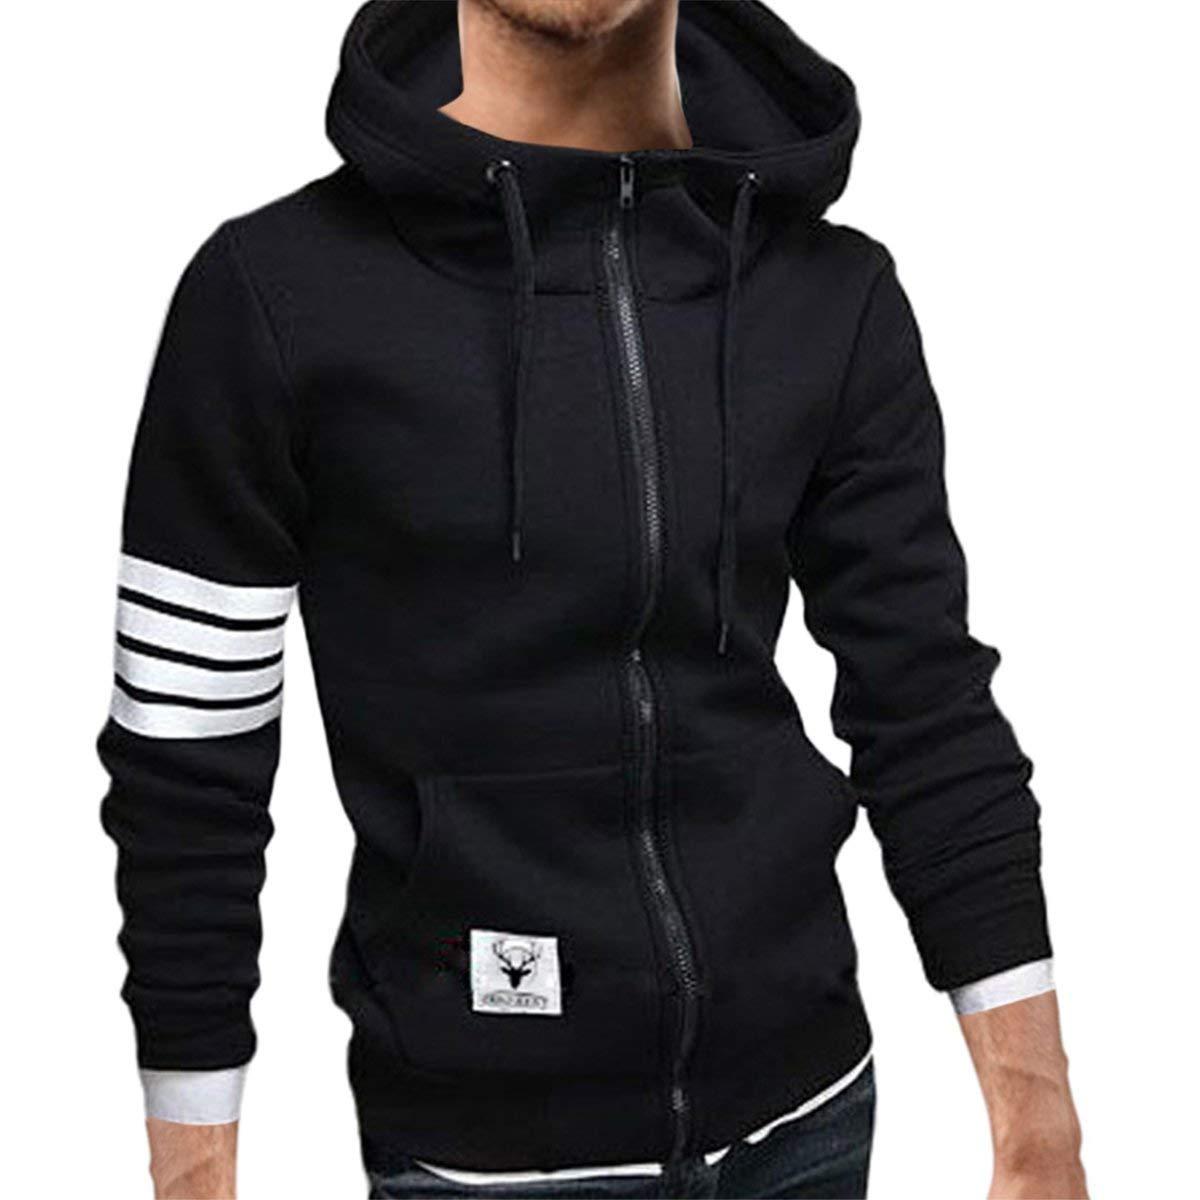 e23ab75cb Get Quotations · Pishon Men's Zip Up Hoodies Cotton Plain Lightweight Long  Sleeve Hoodie Sweatshirt